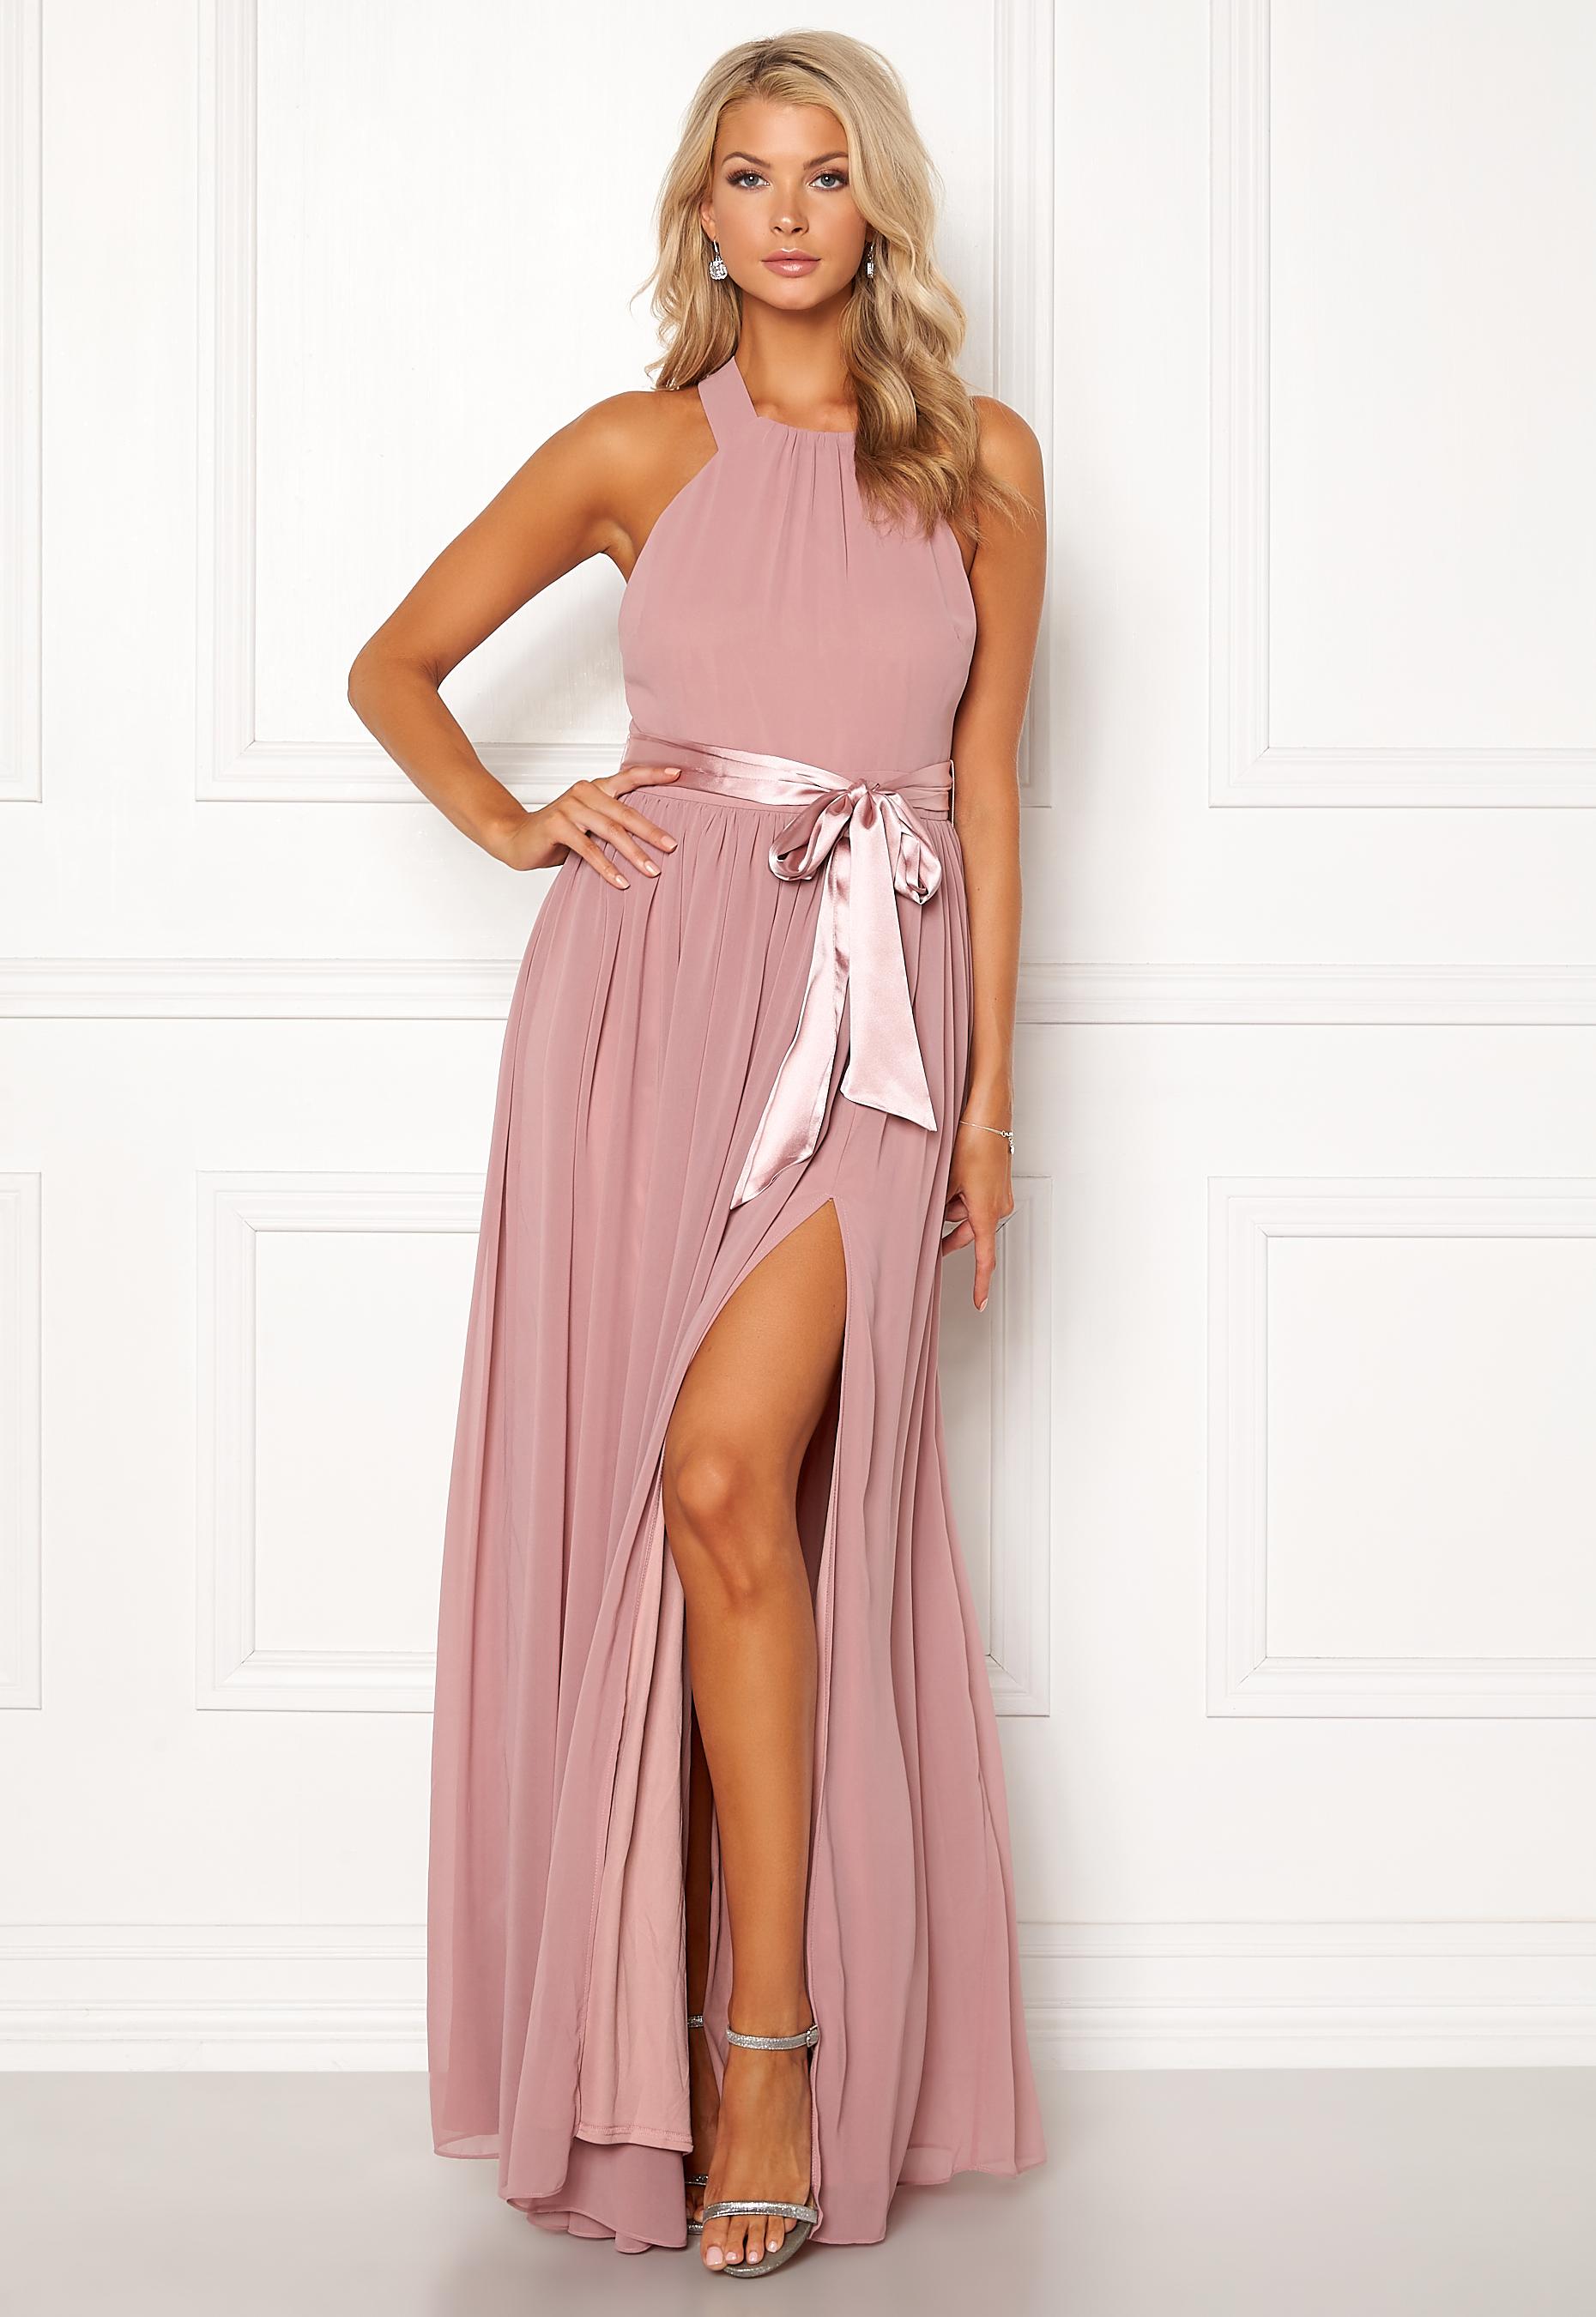 e92227ce775a Goddiva Cross Back Chiffon Dress Lavender - Bubbleroom